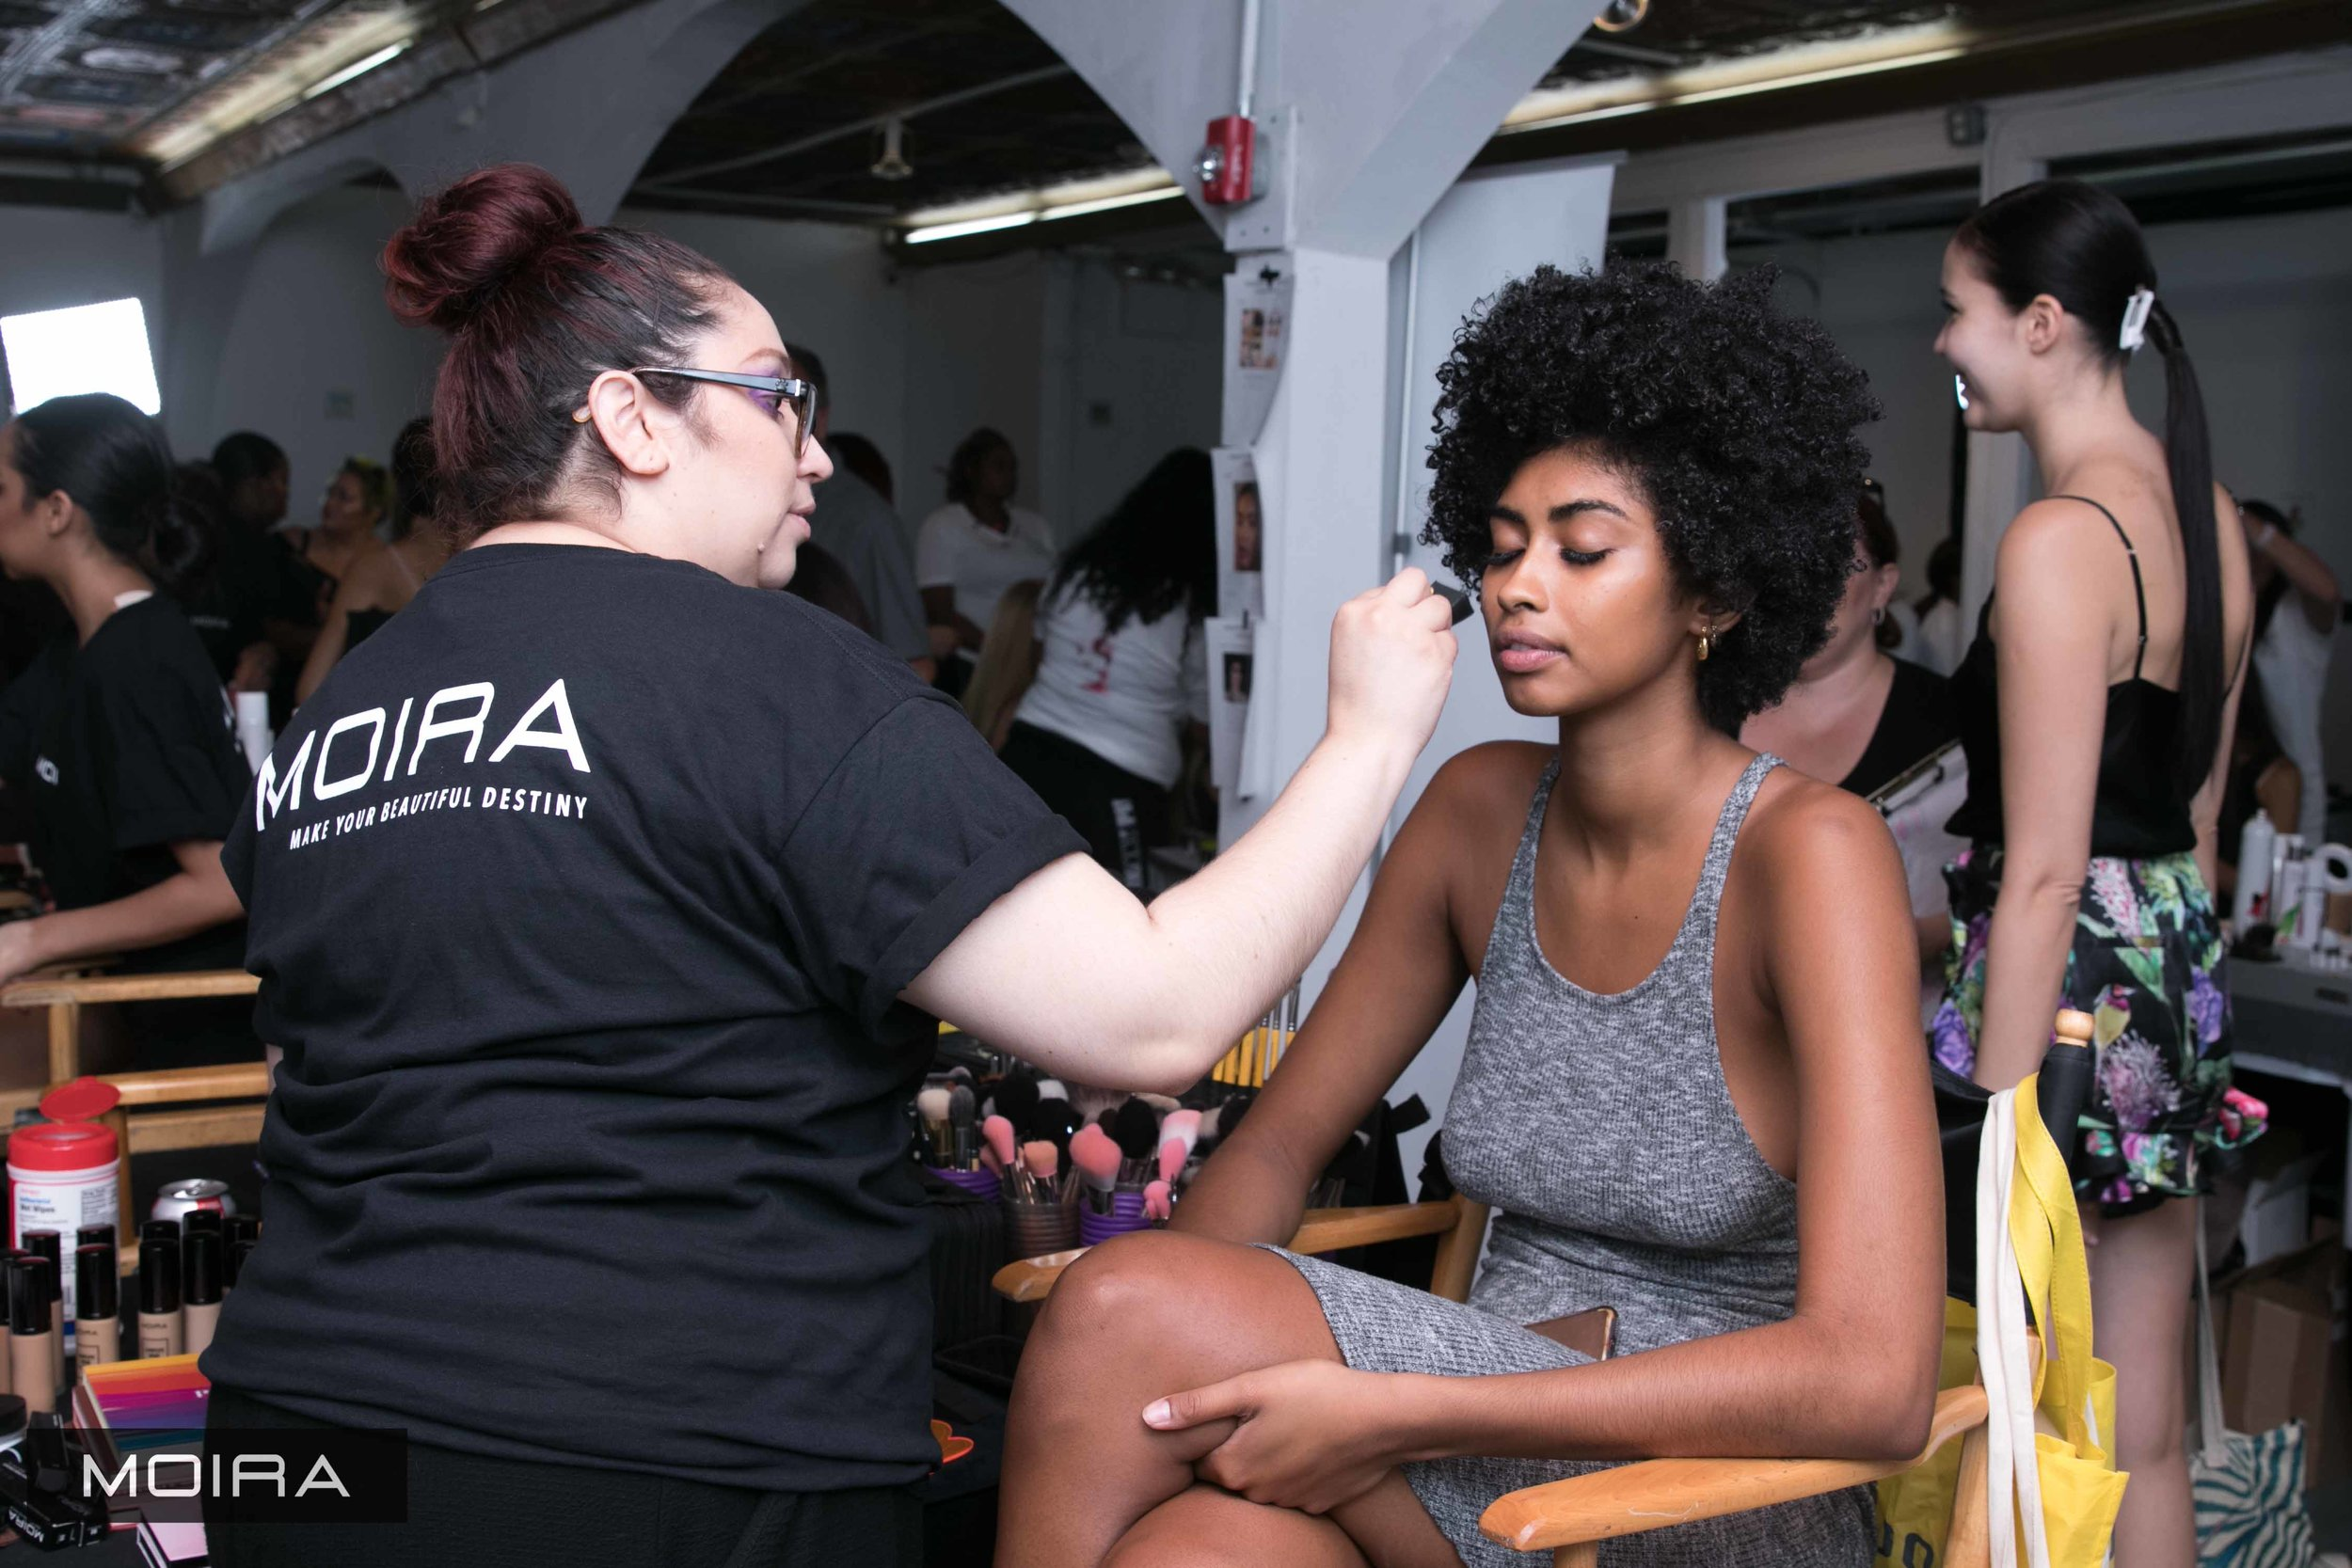 MOIRA_Cosmetics_New_York_Fashion_Week_2018-1.jpg